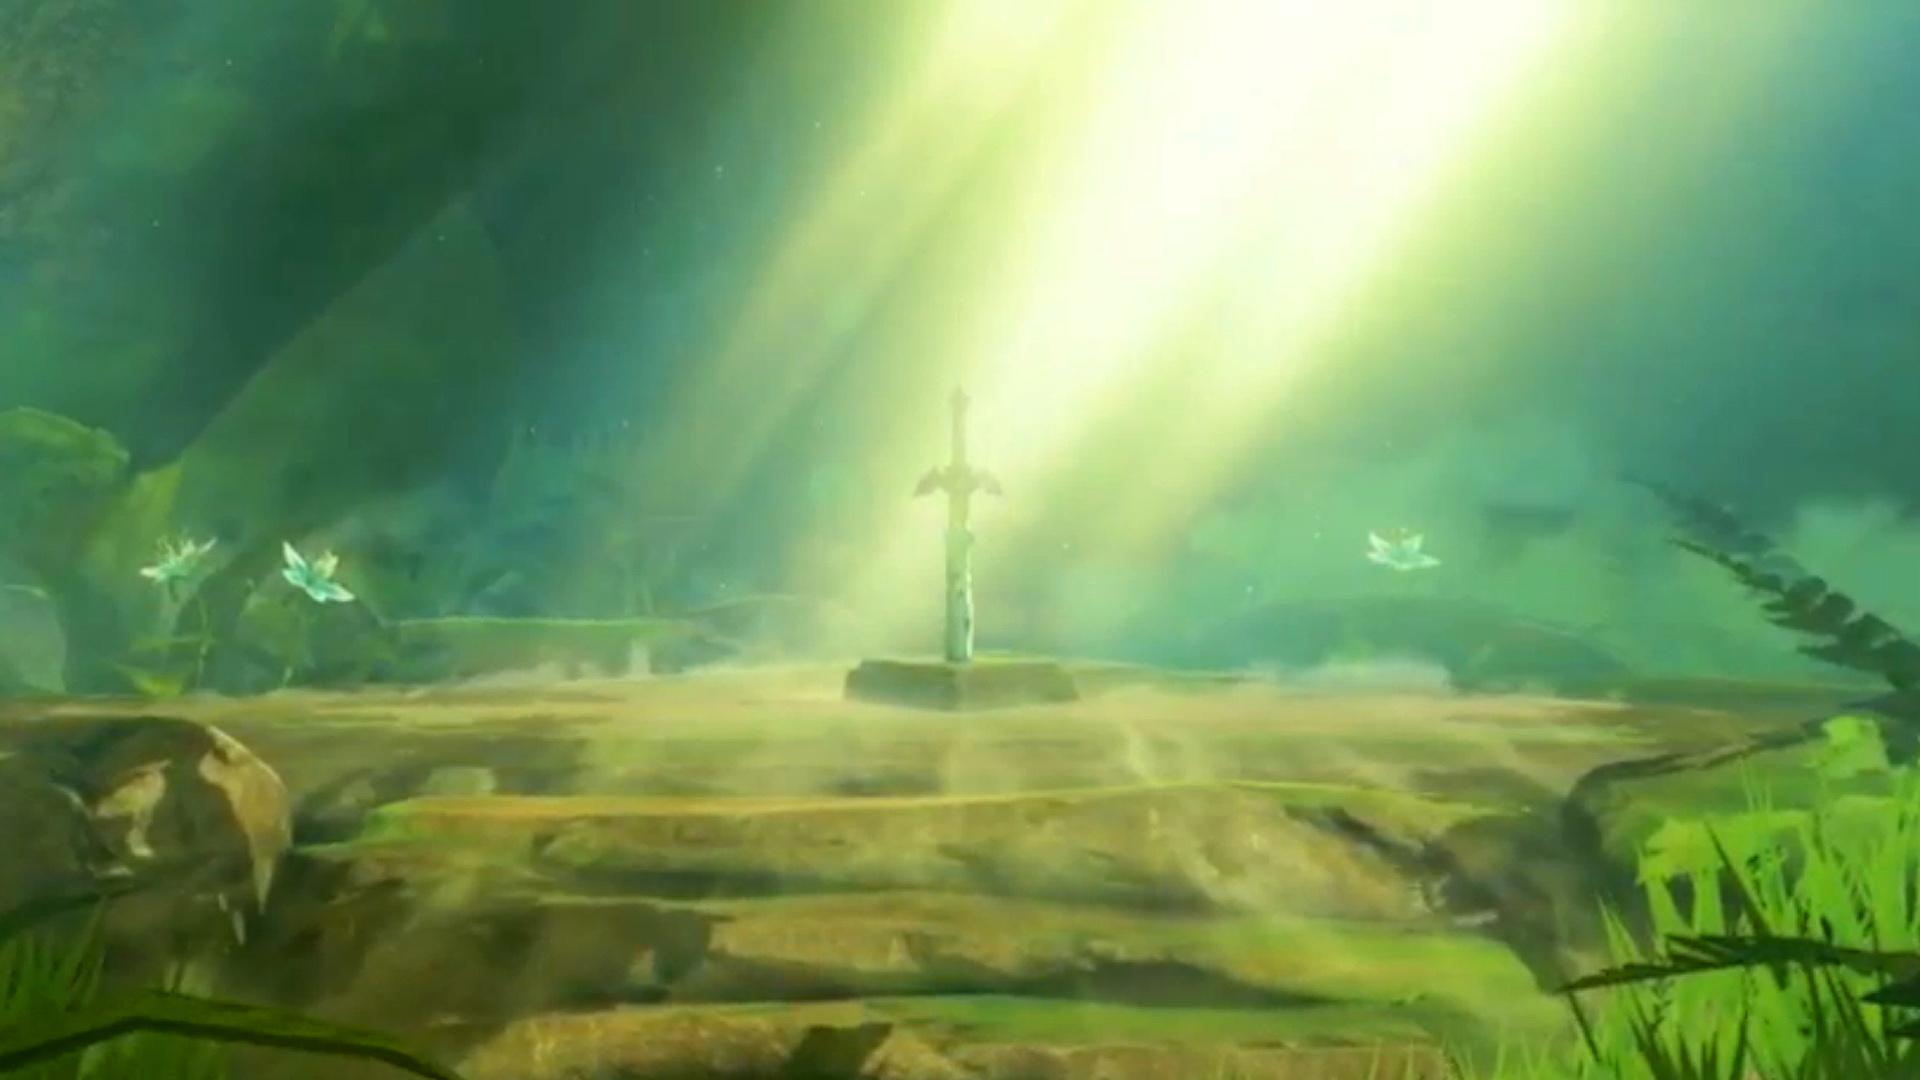 Master Sword (courtesy Nintendowire)